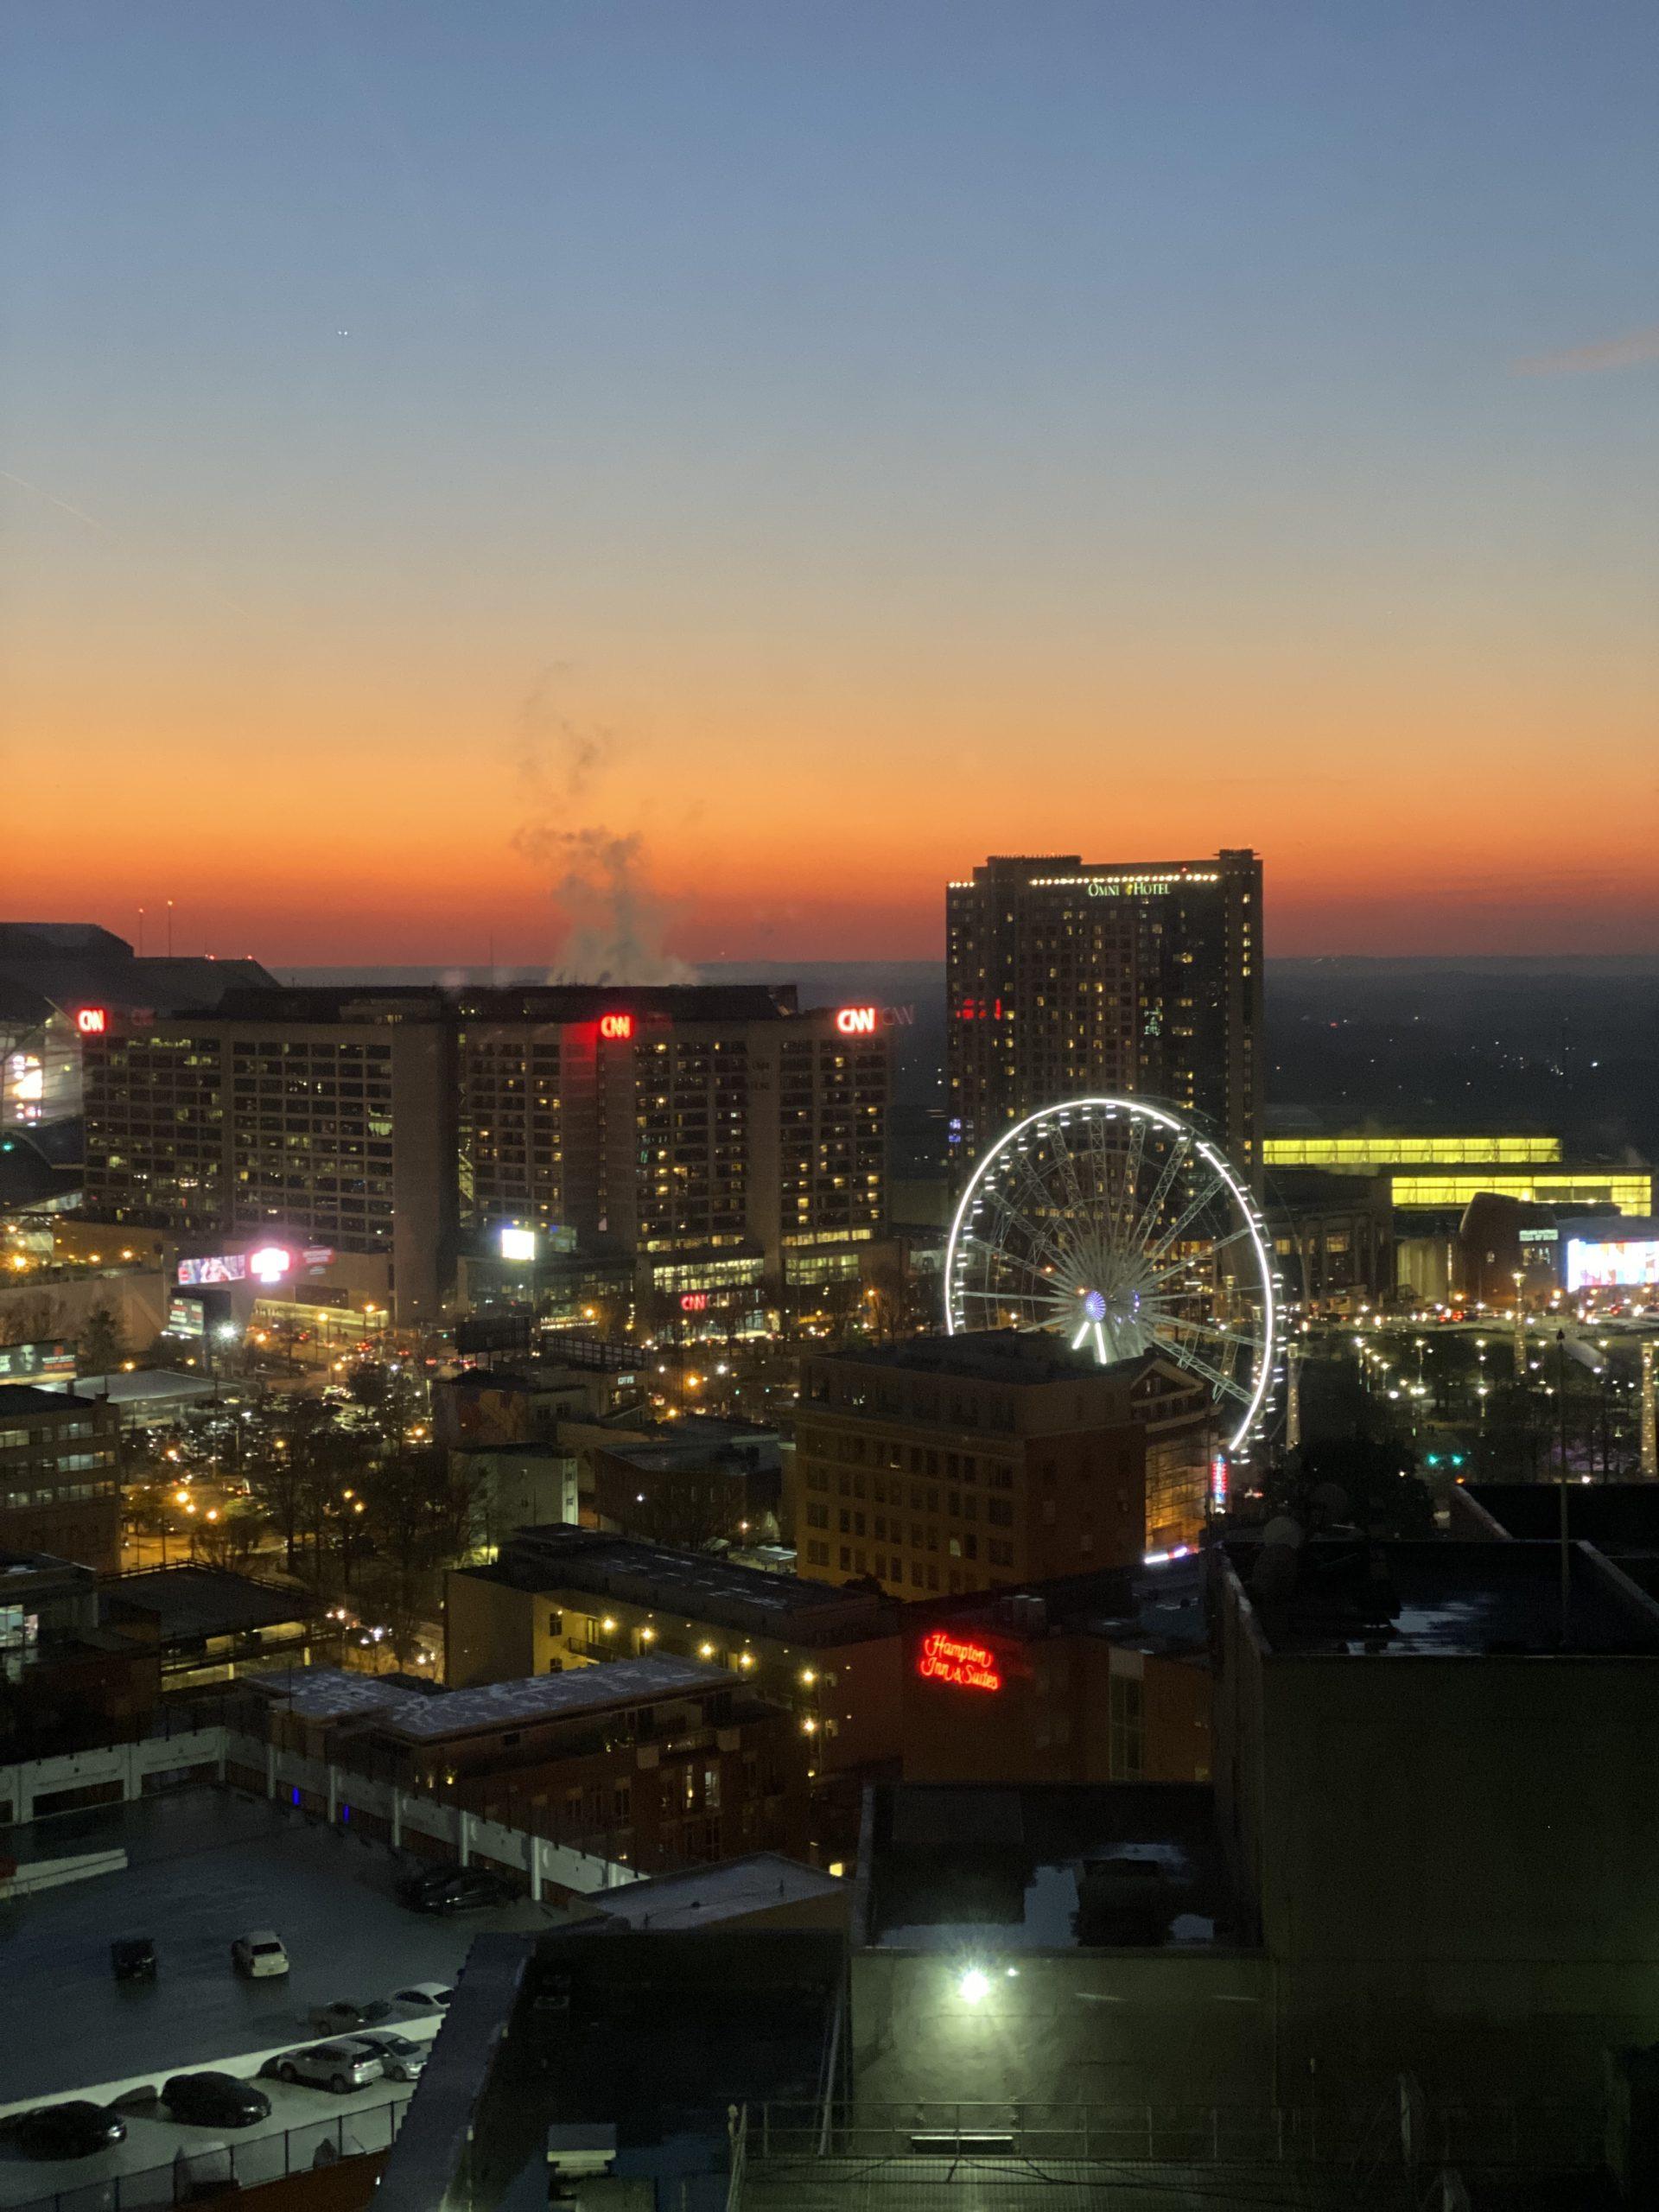 ritz Carlton, #RCmemories, ritz Carlton atlanta, atl, Atlanta, Atlanta shopping, travel, wanderlust